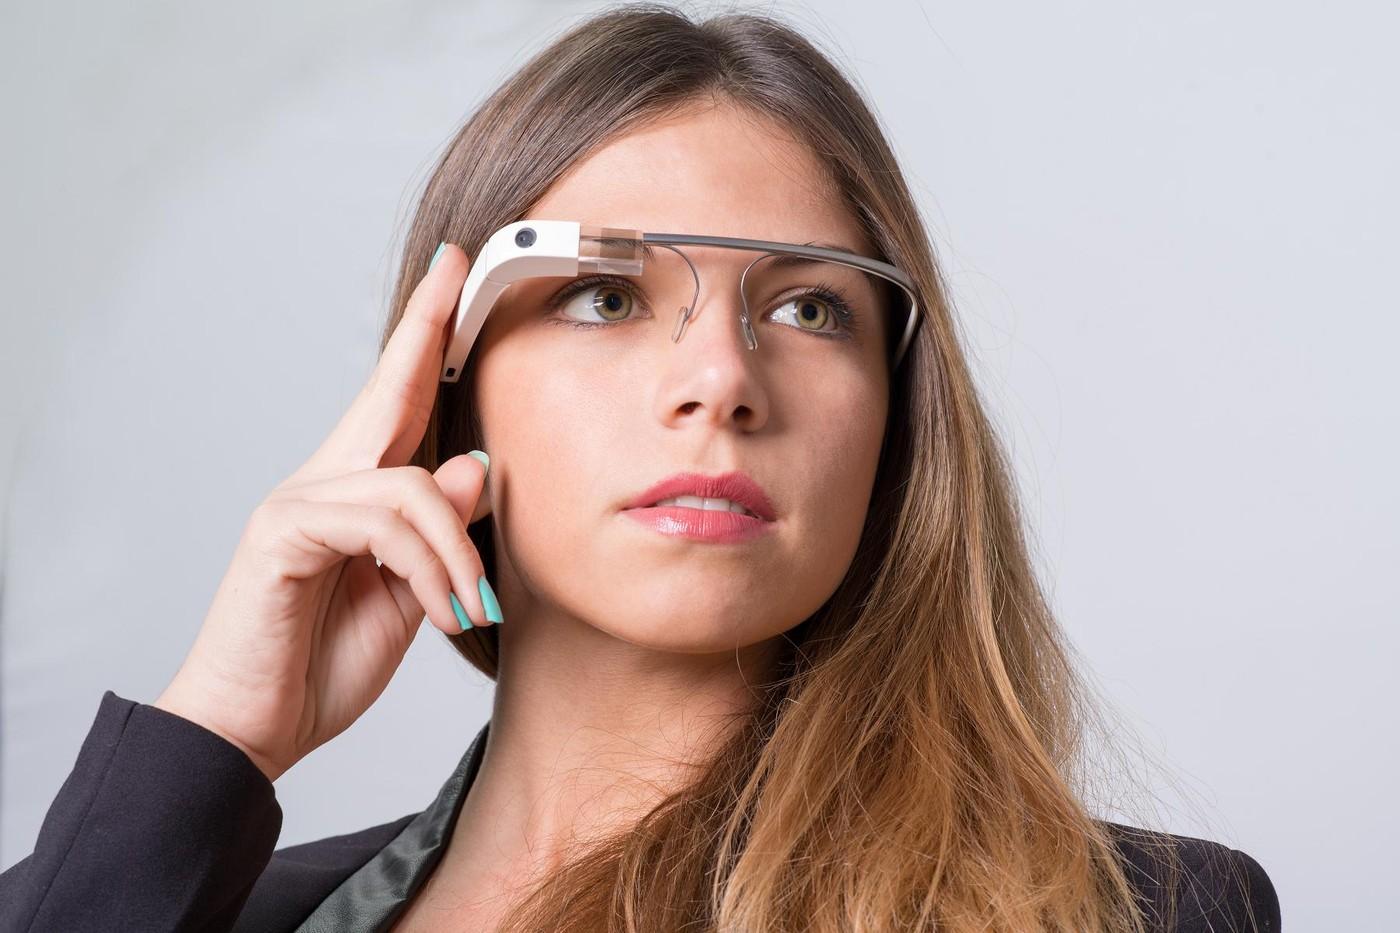 Google眼鏡再度歸來!第三代終於降到iPhone價了 數位時代